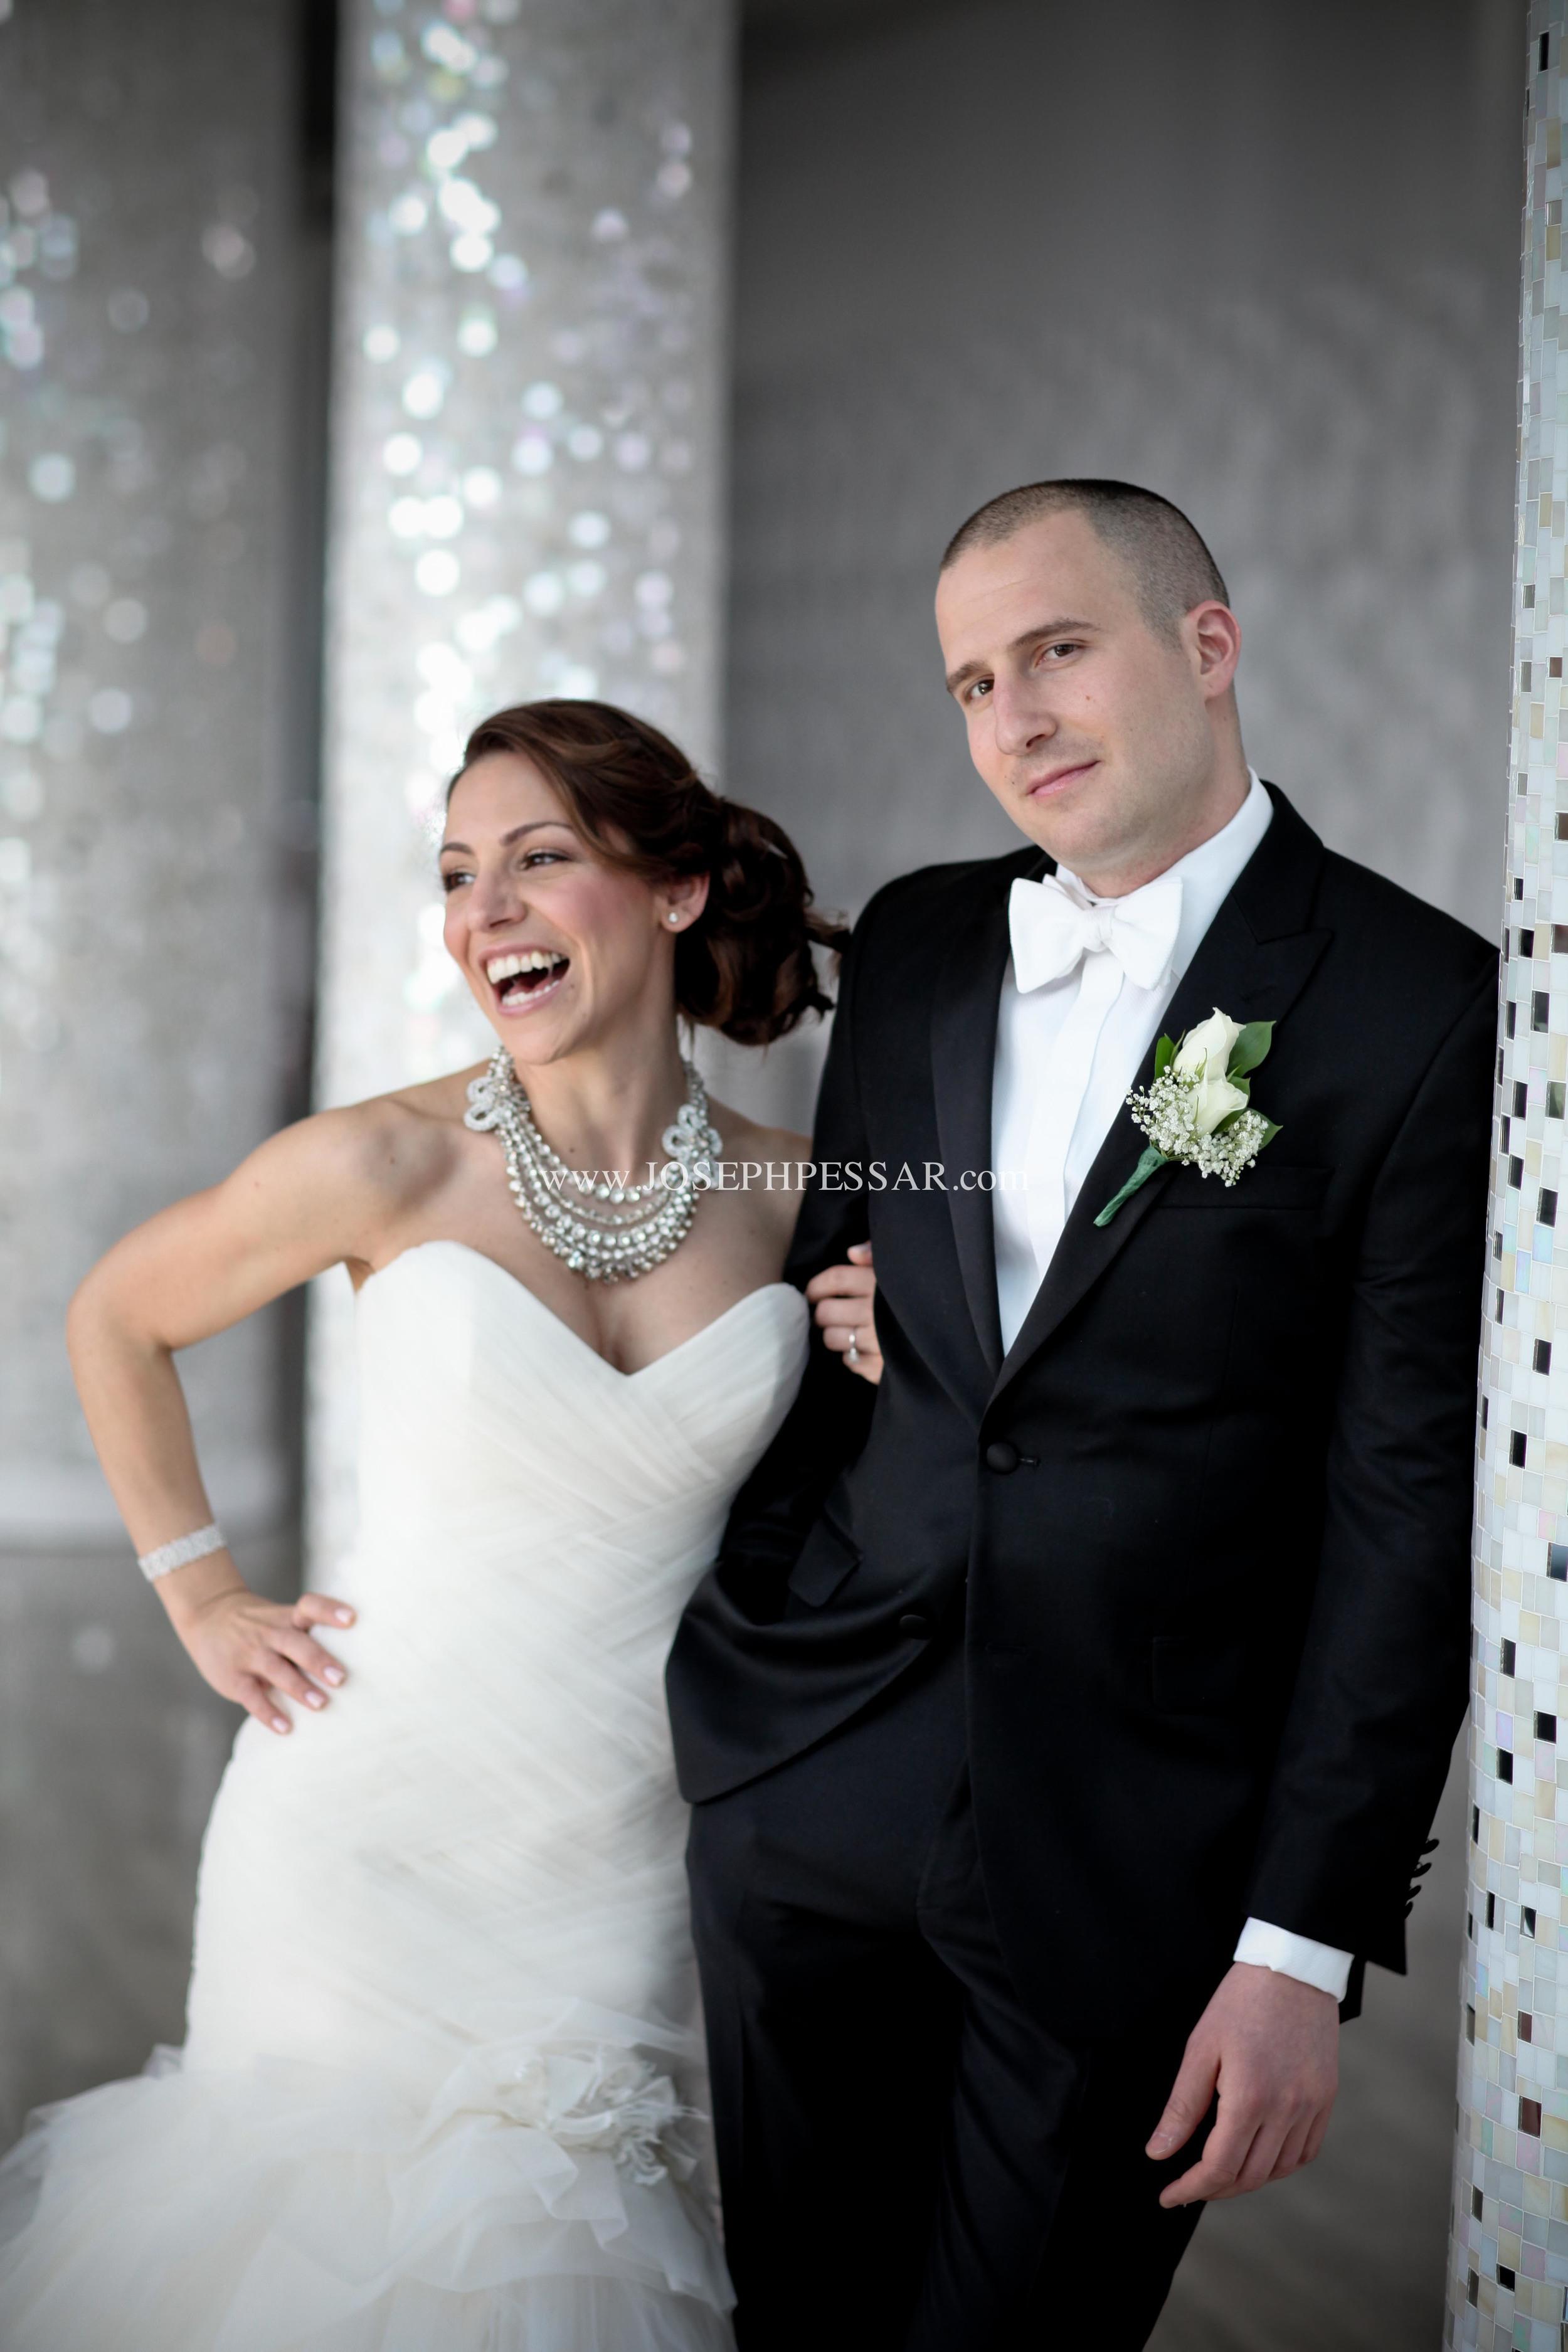 nyc_wedding_photographer0018.jpg